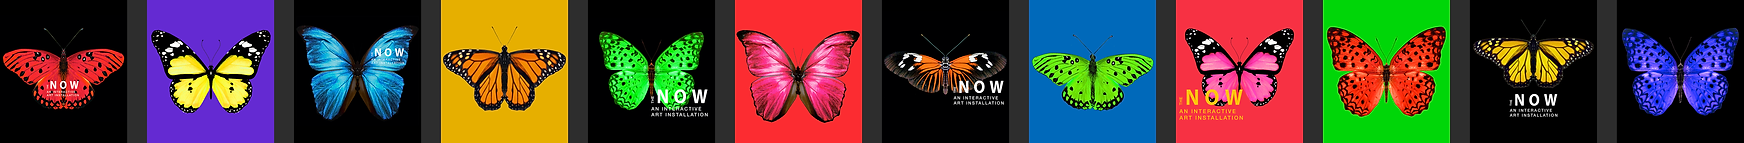 LAYOUT_butterflies.png